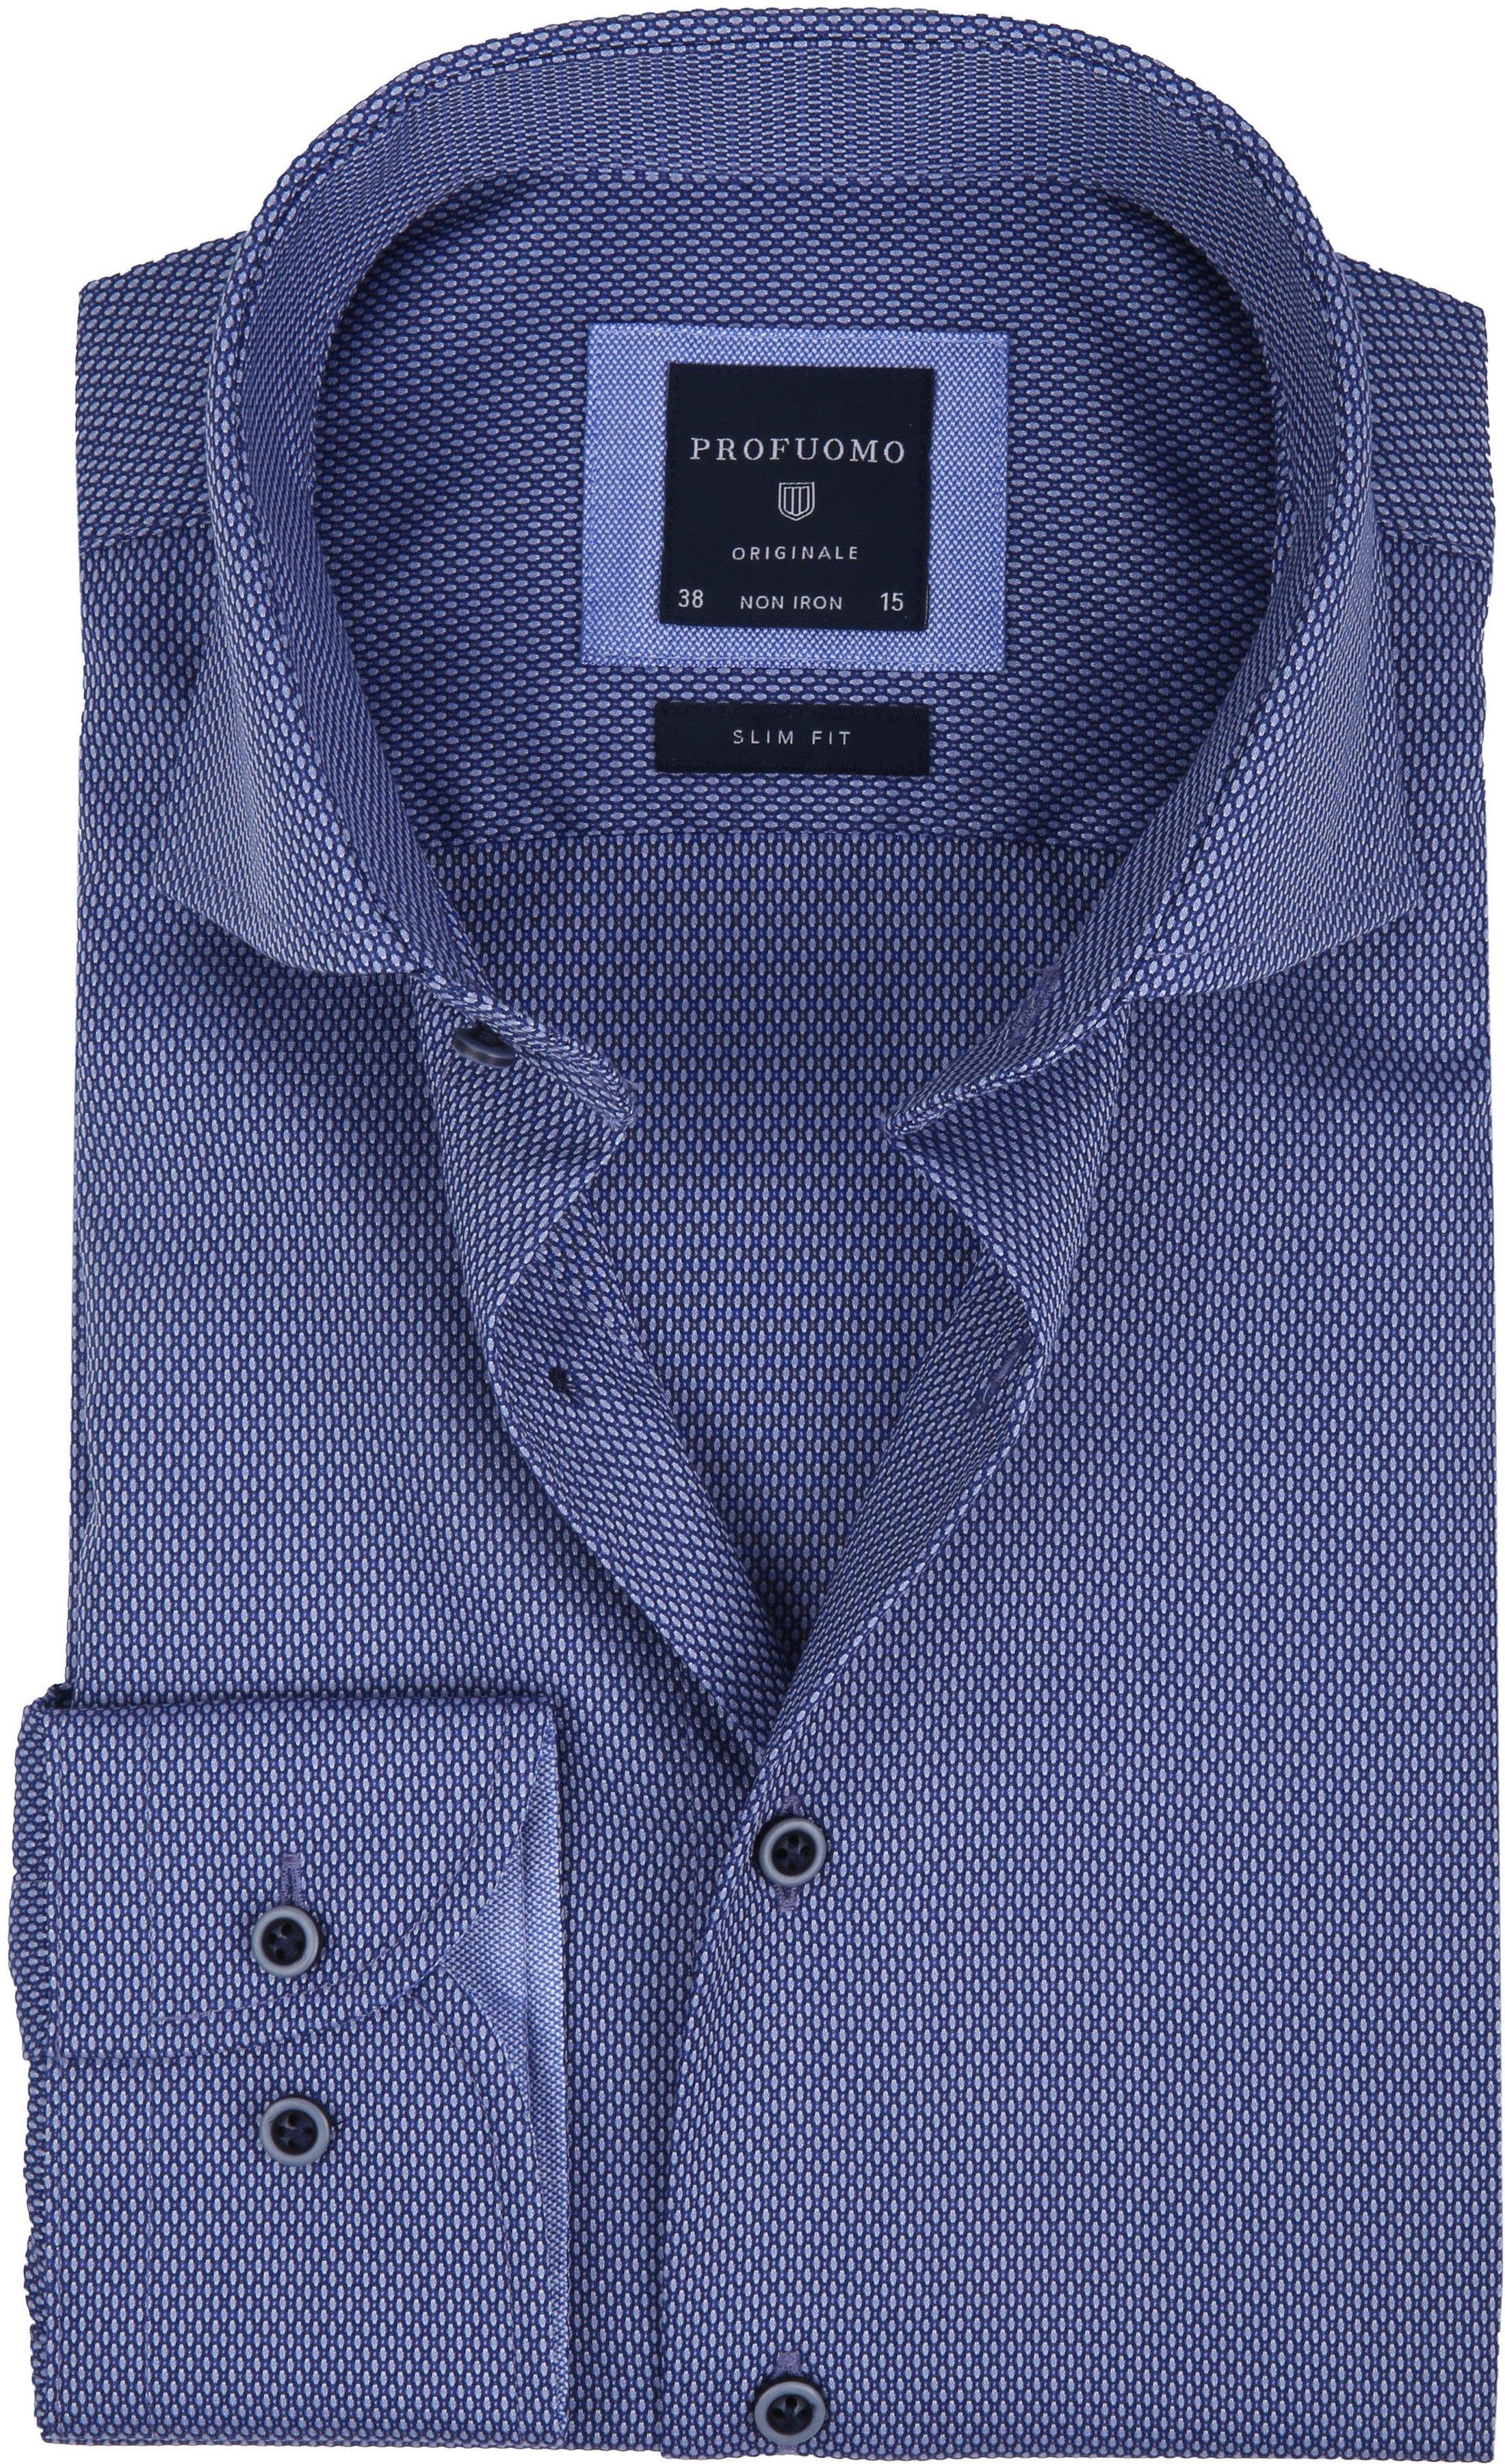 Profuomo Overhemd Slim-Fit Non Iron Blauw foto 0